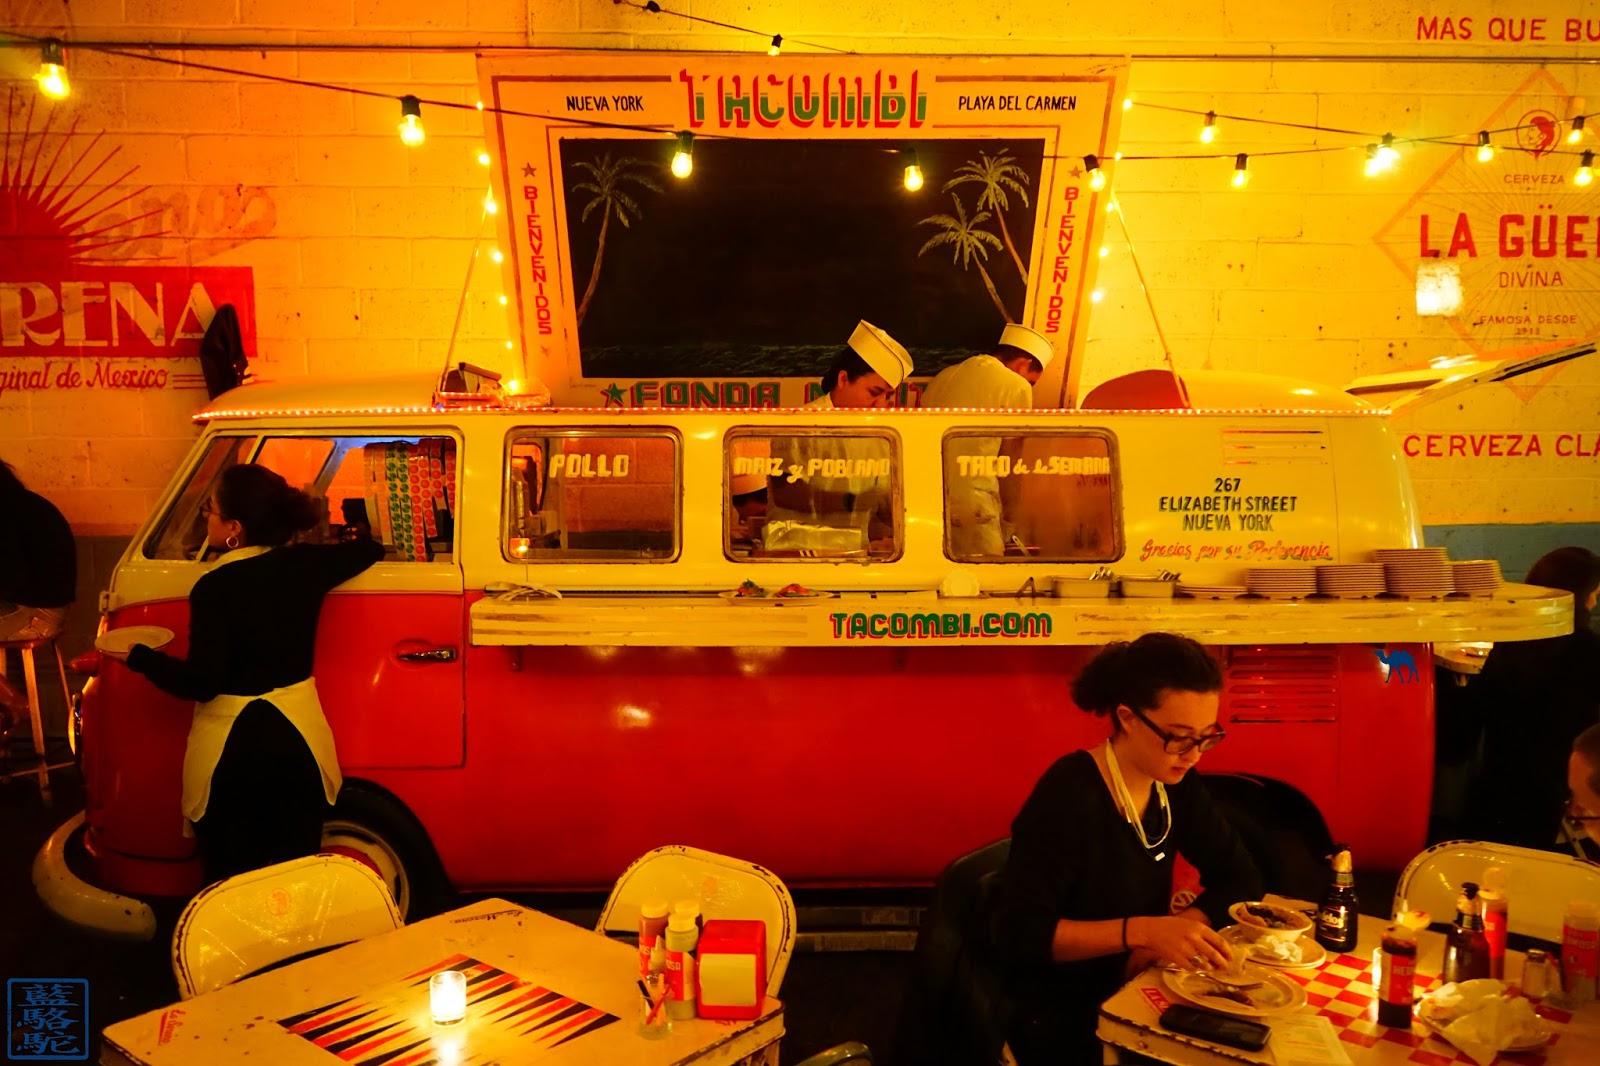 Le Chameau Bleu - Tacombi - Camionnette - Resto mexicain New York USA